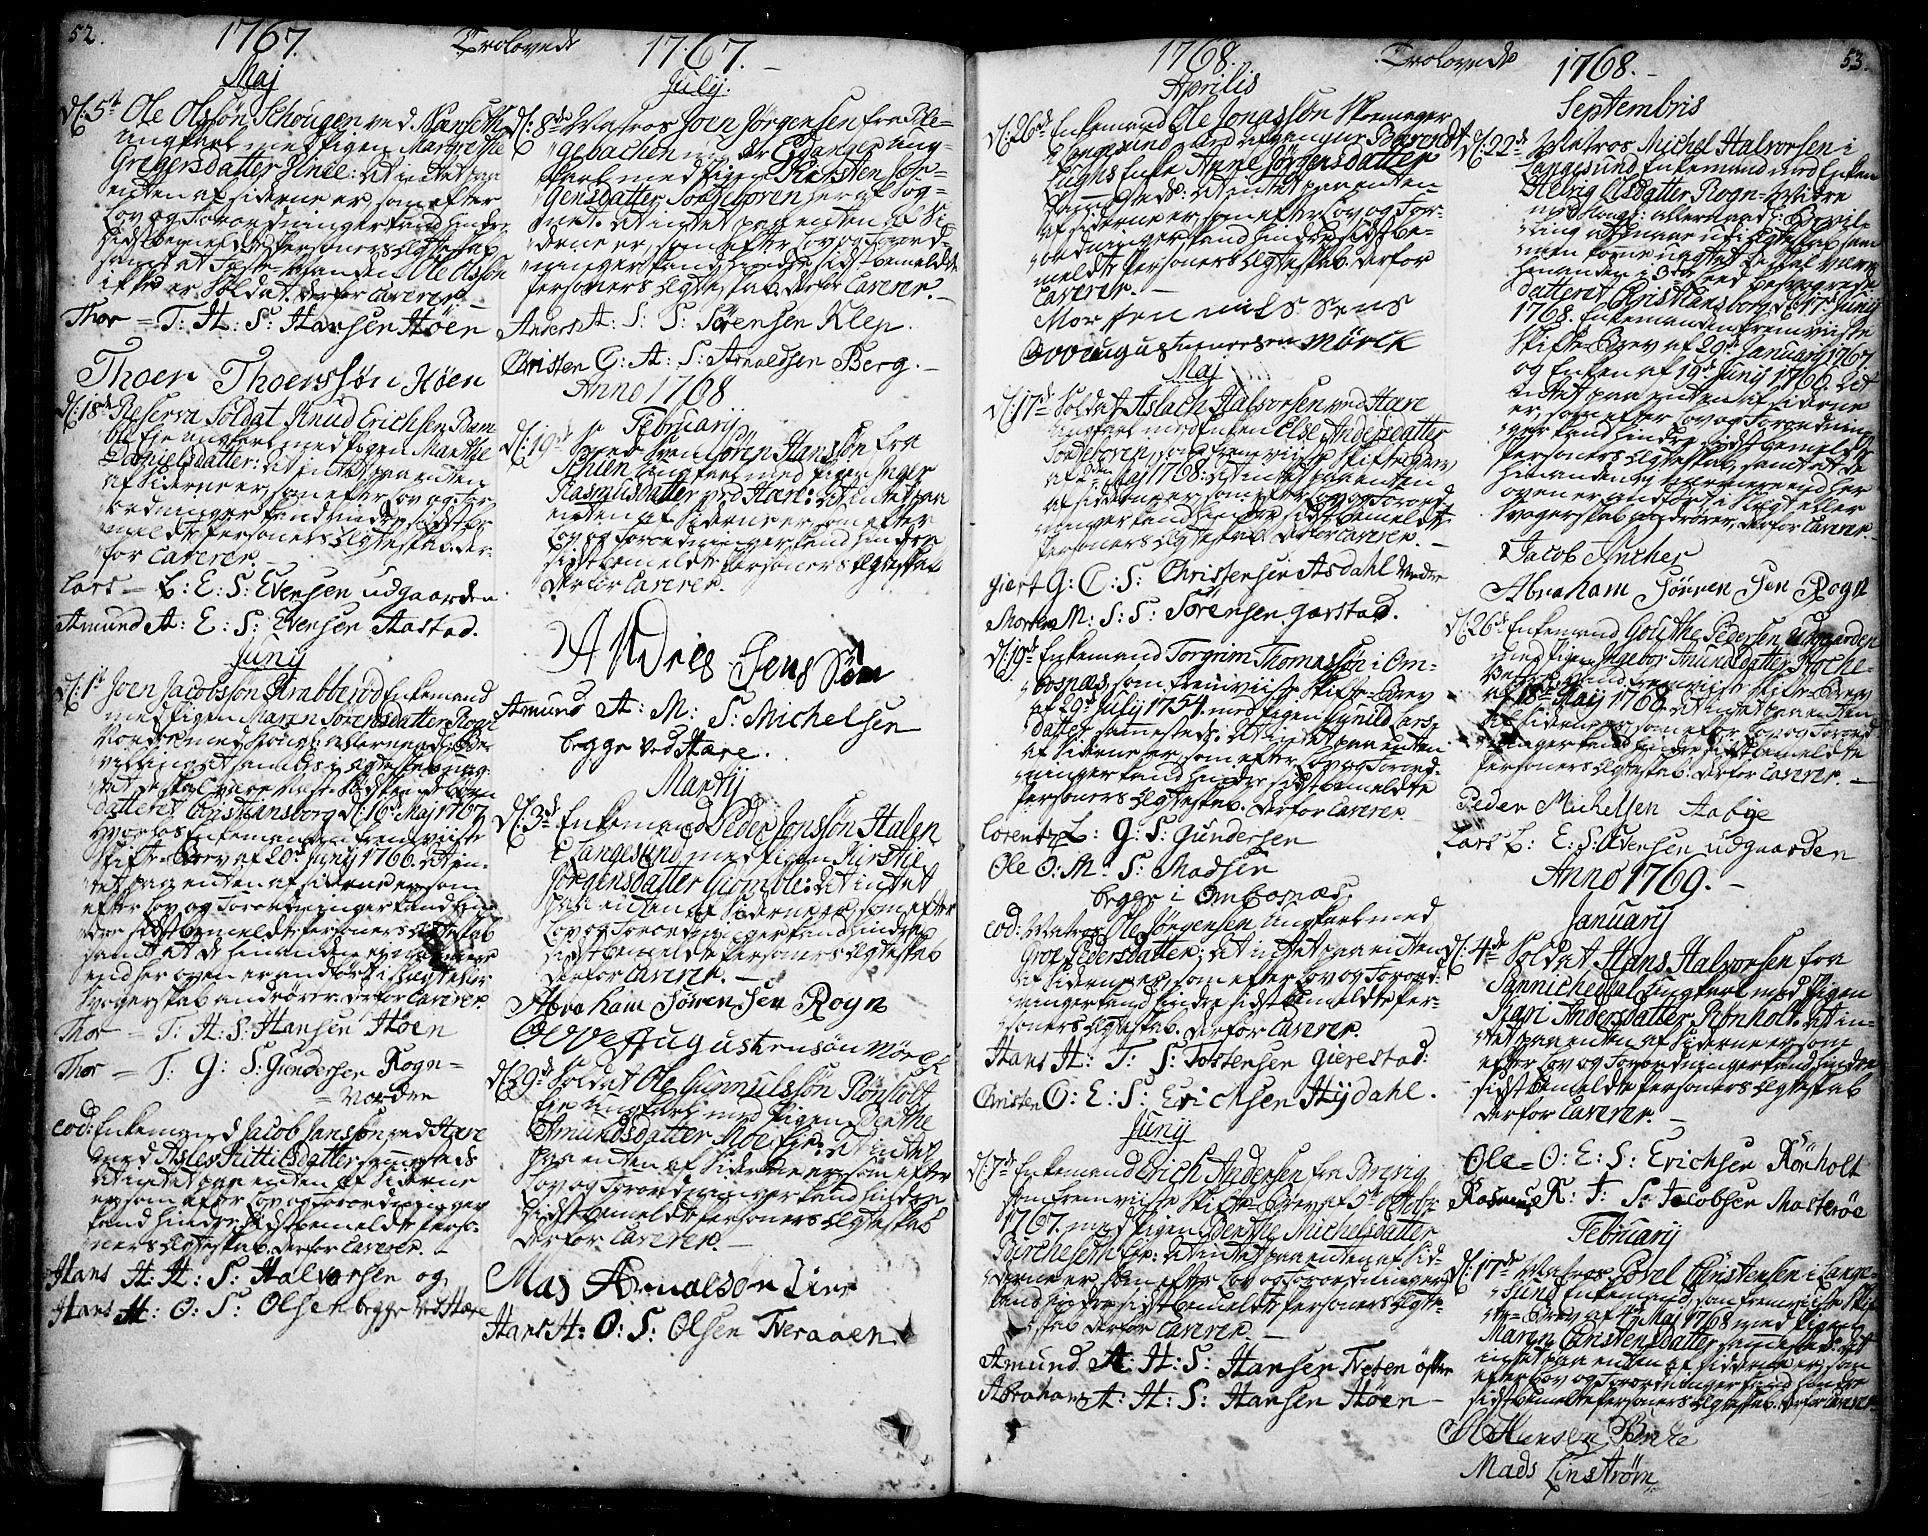 SAKO, Bamble kirkebøker, F/Fa/L0001: Ministerialbok nr. I 1, 1702-1774, s. 52-53